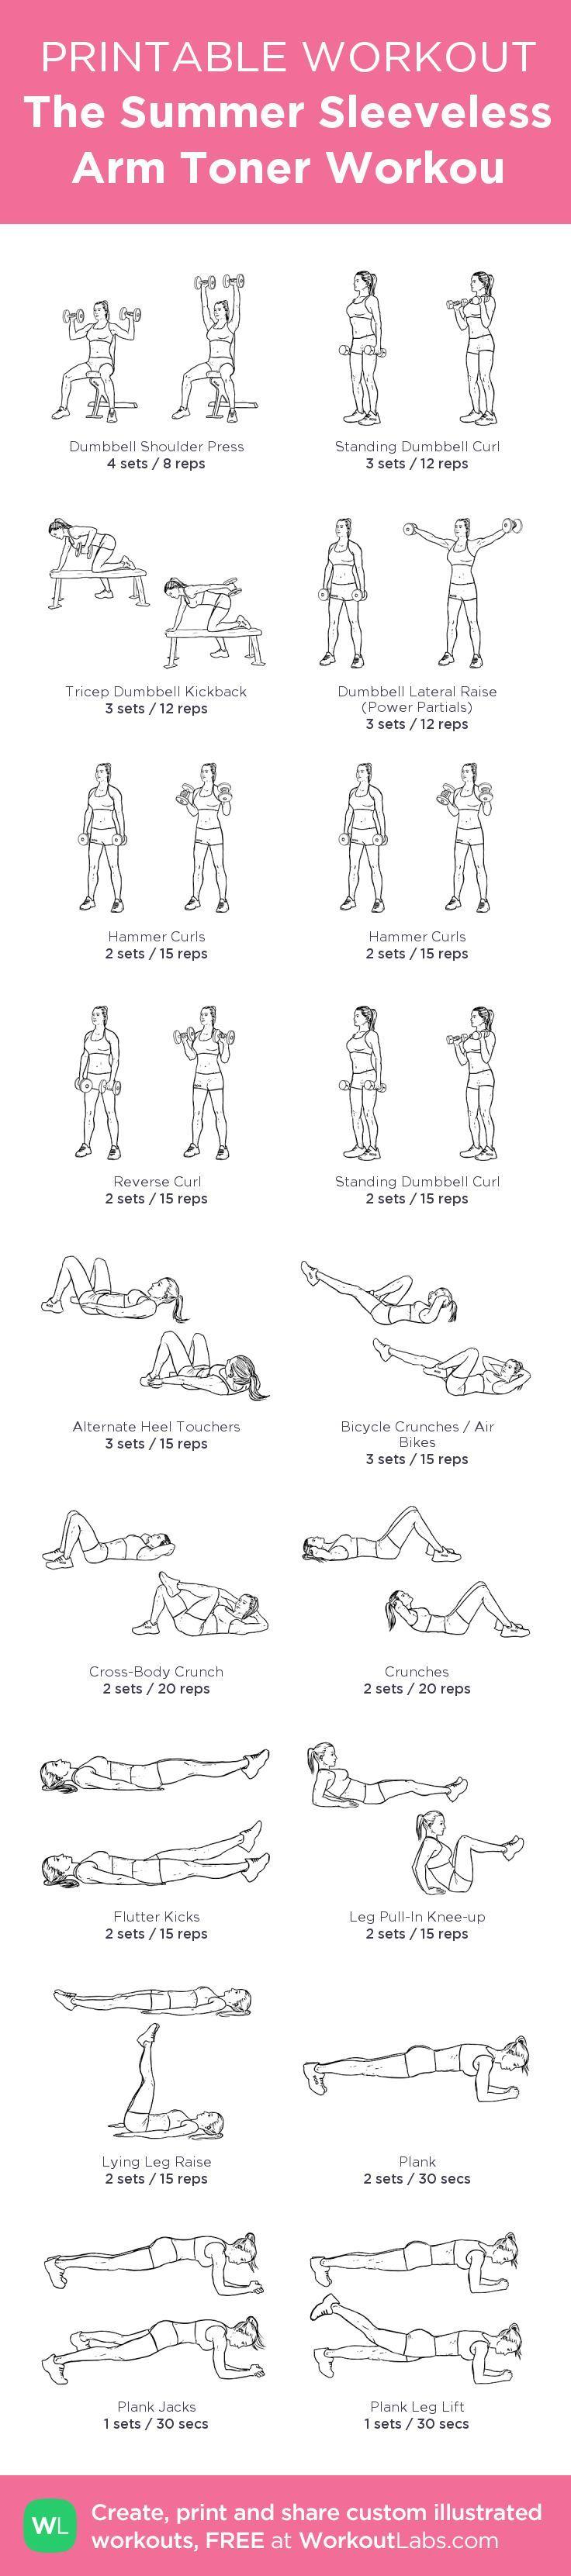 The Summer Sleeveless Arm Toner Workou: my custom printable workout by @WorkoutLabs #workoutlabs #customworkout